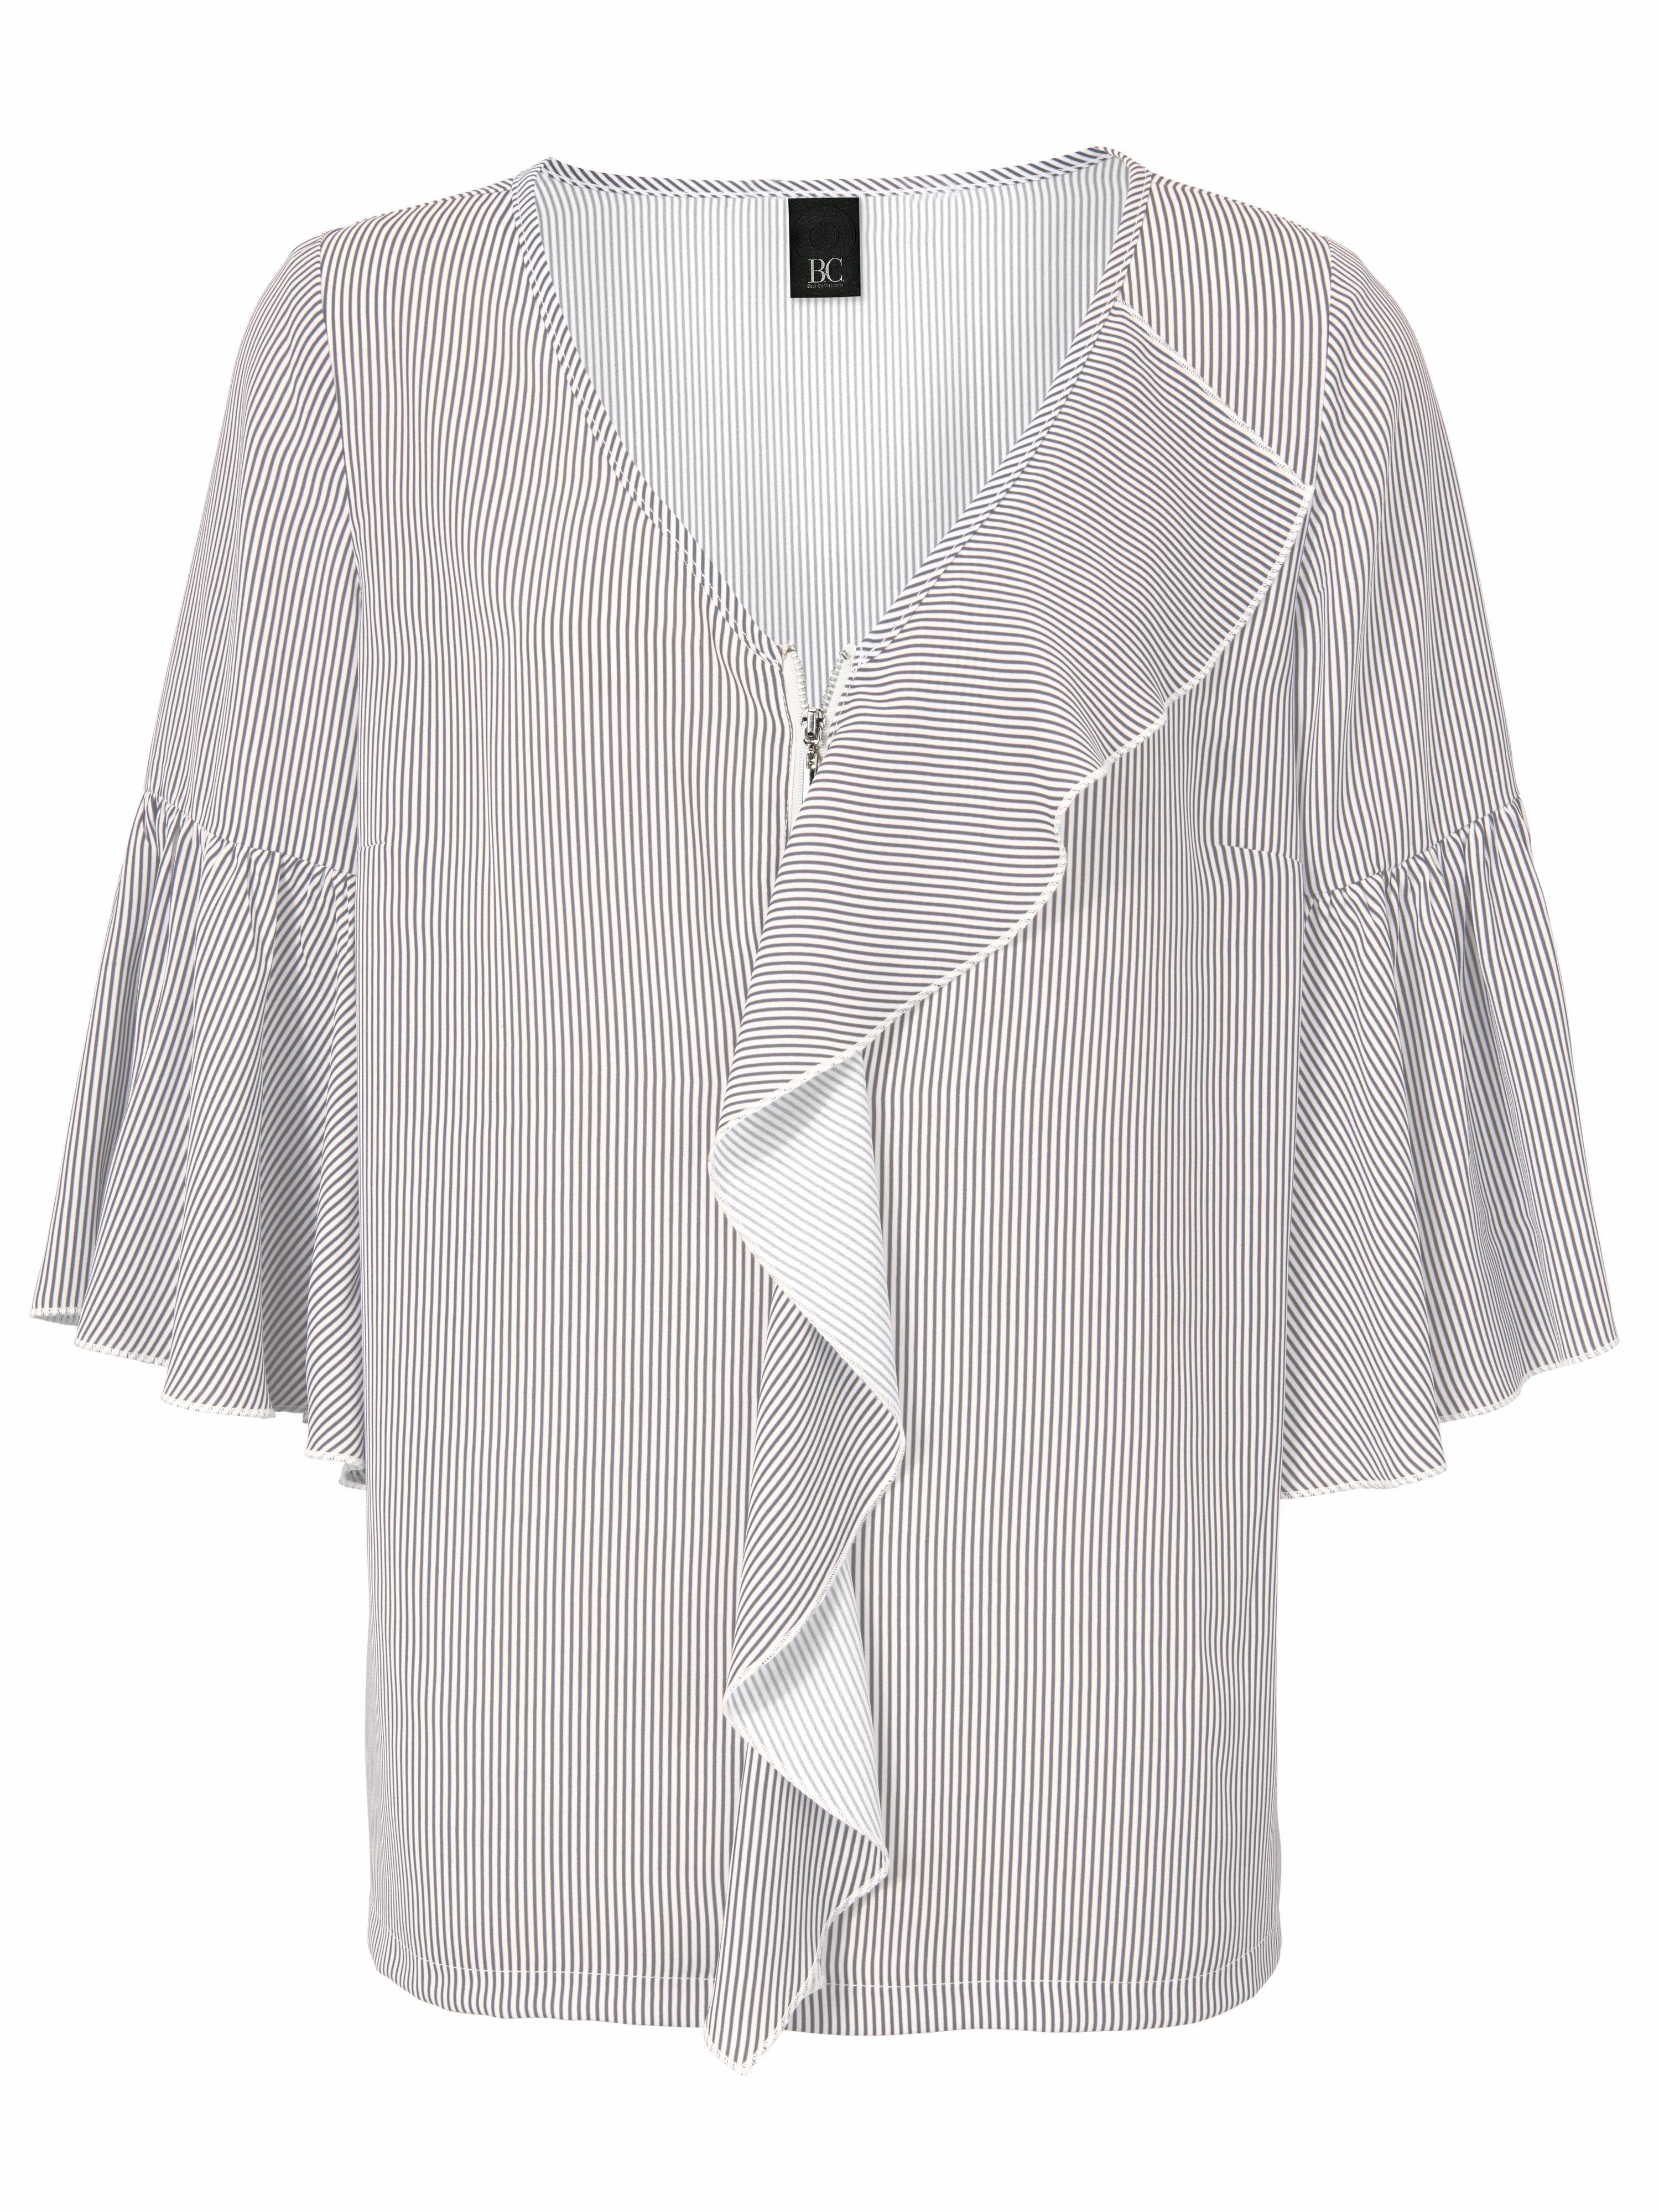 Heine Casual Gestreepte blouse nu online bestellen